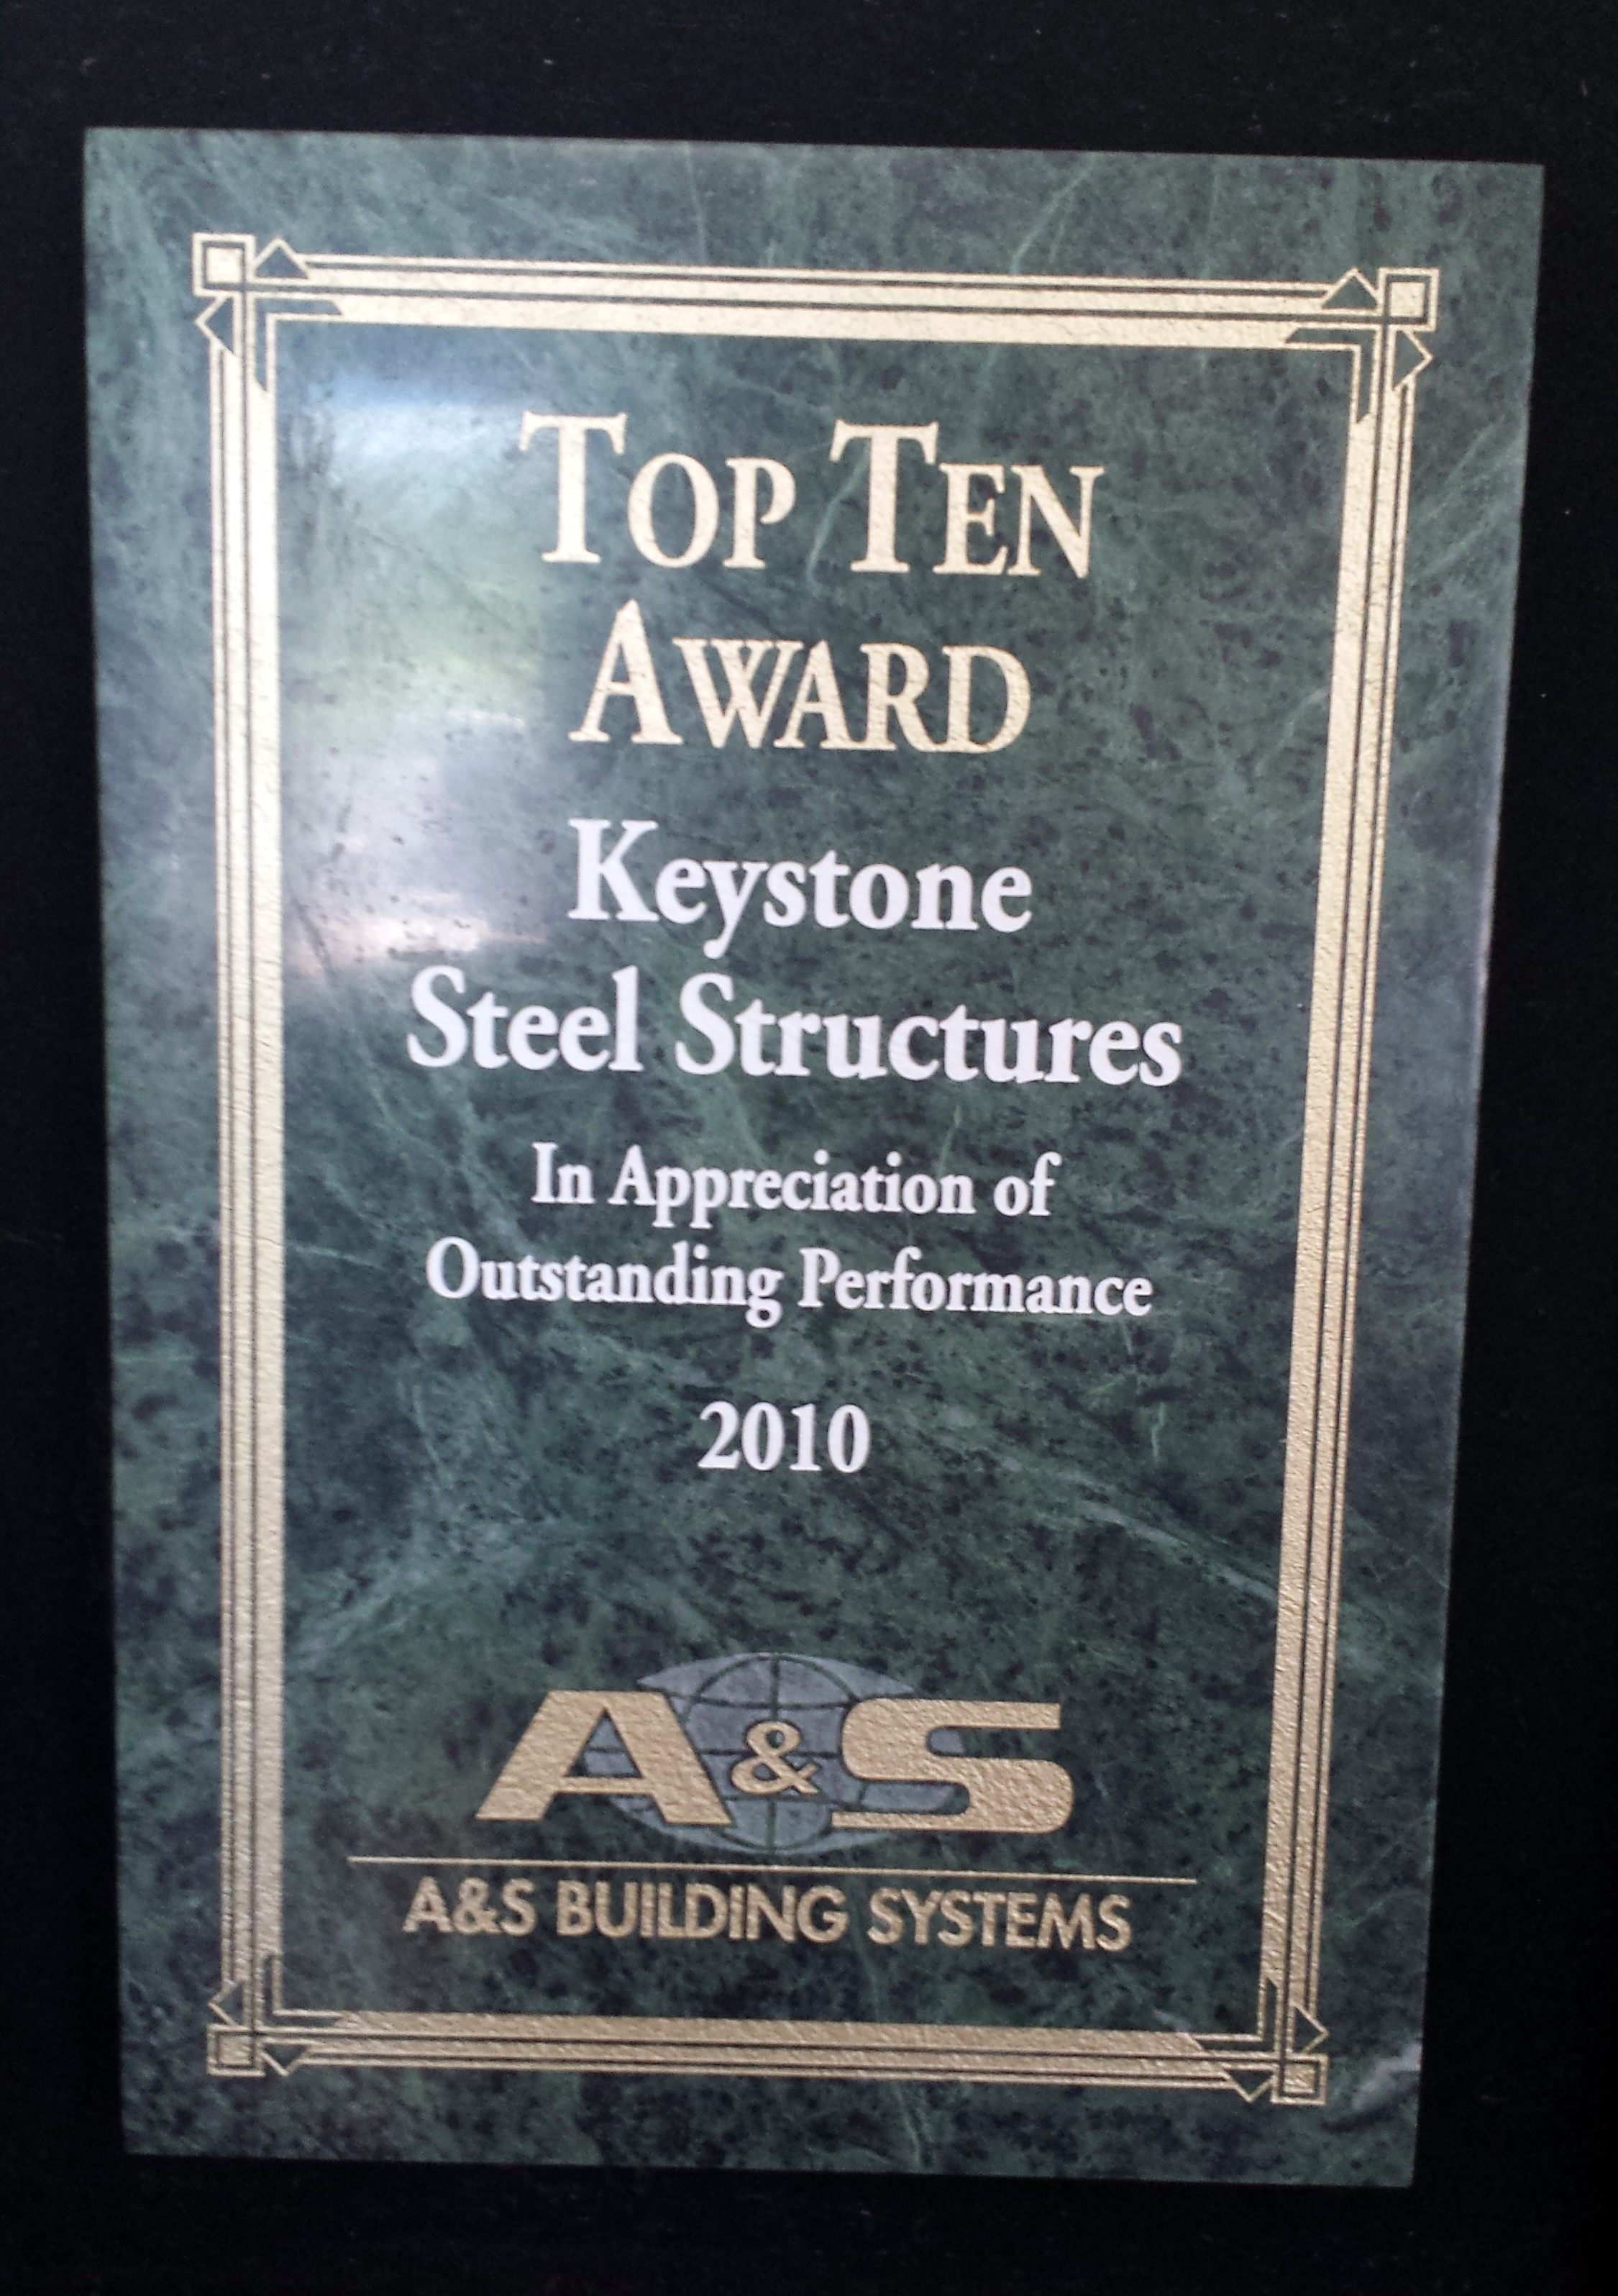 2010 Top Ten Award